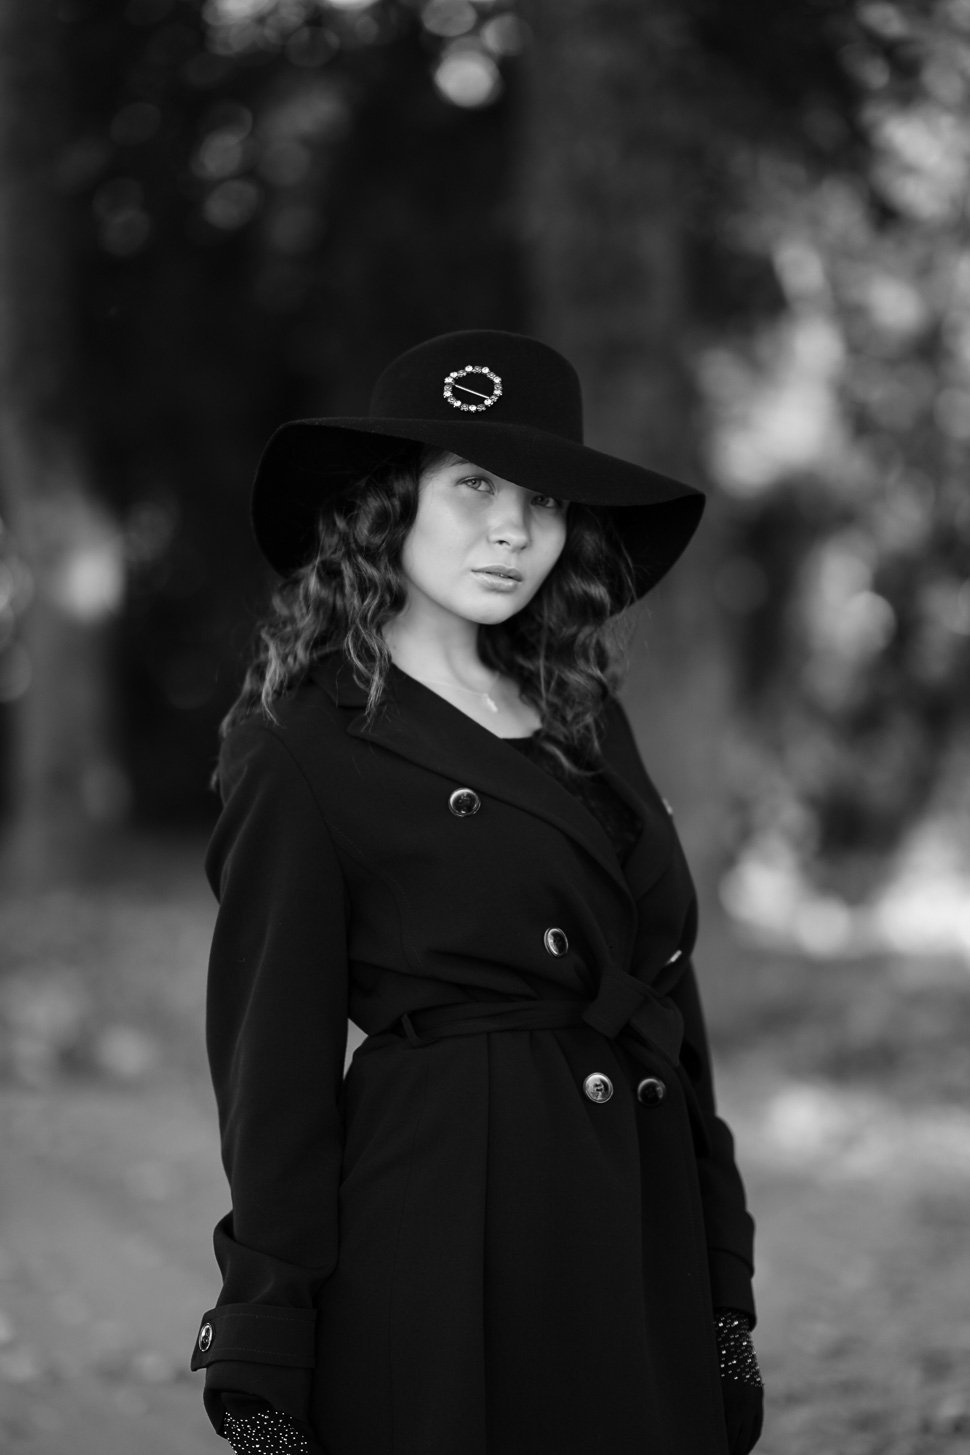 beautiful_black_and_white_portrait_photography_69.jpg